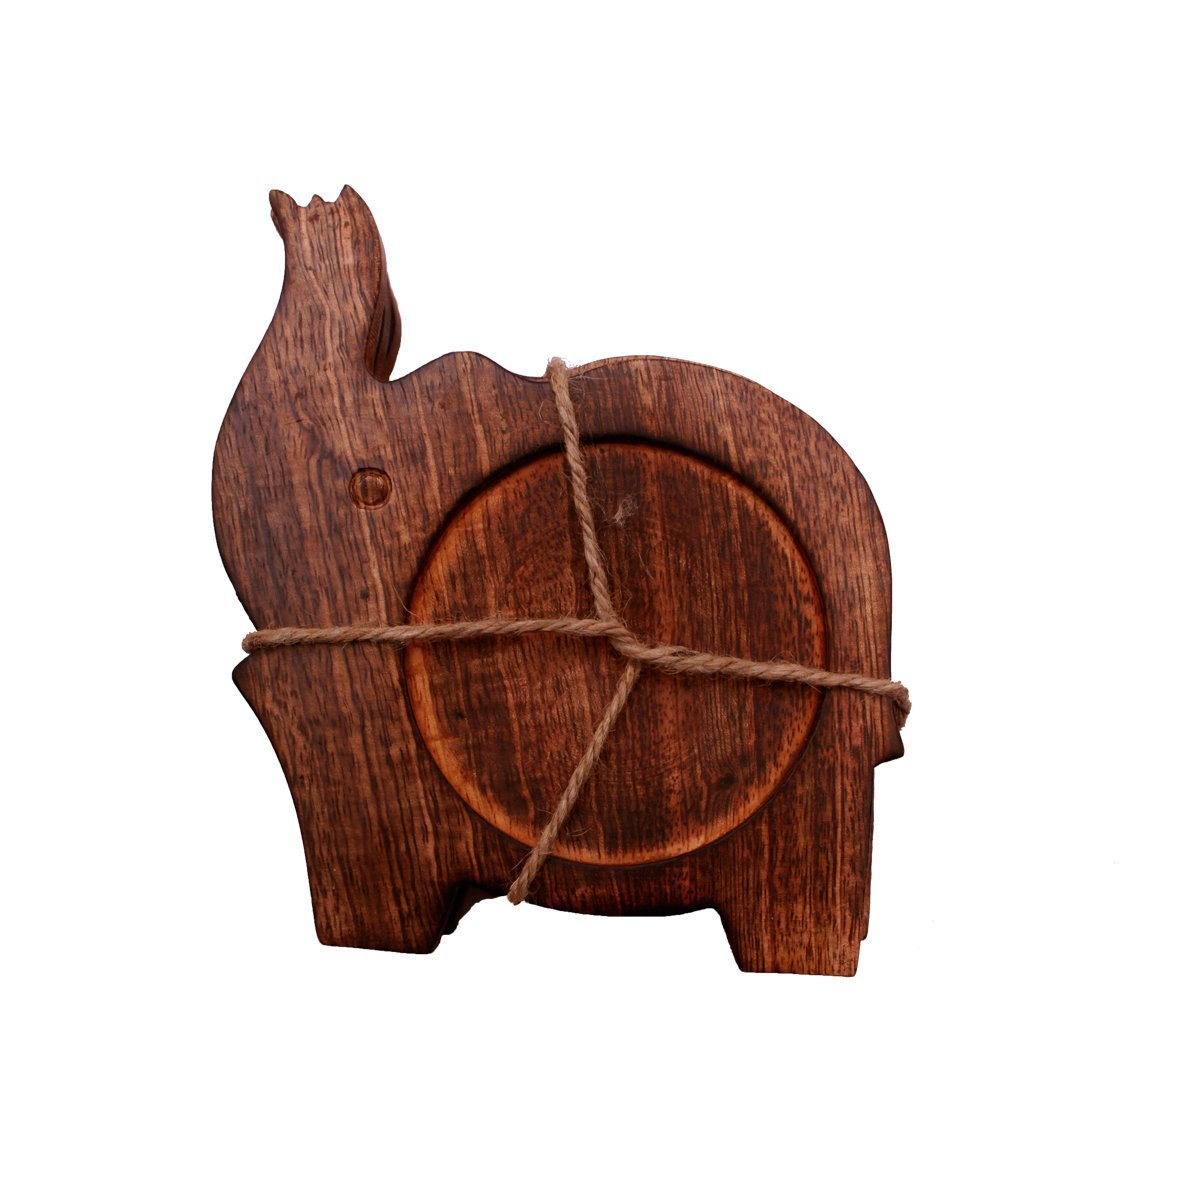 Handmade Wooden Elephant Coaster Holder For Drinks Beer Wine Glass Tea Coffee Cup Mug by Kamla Sellers